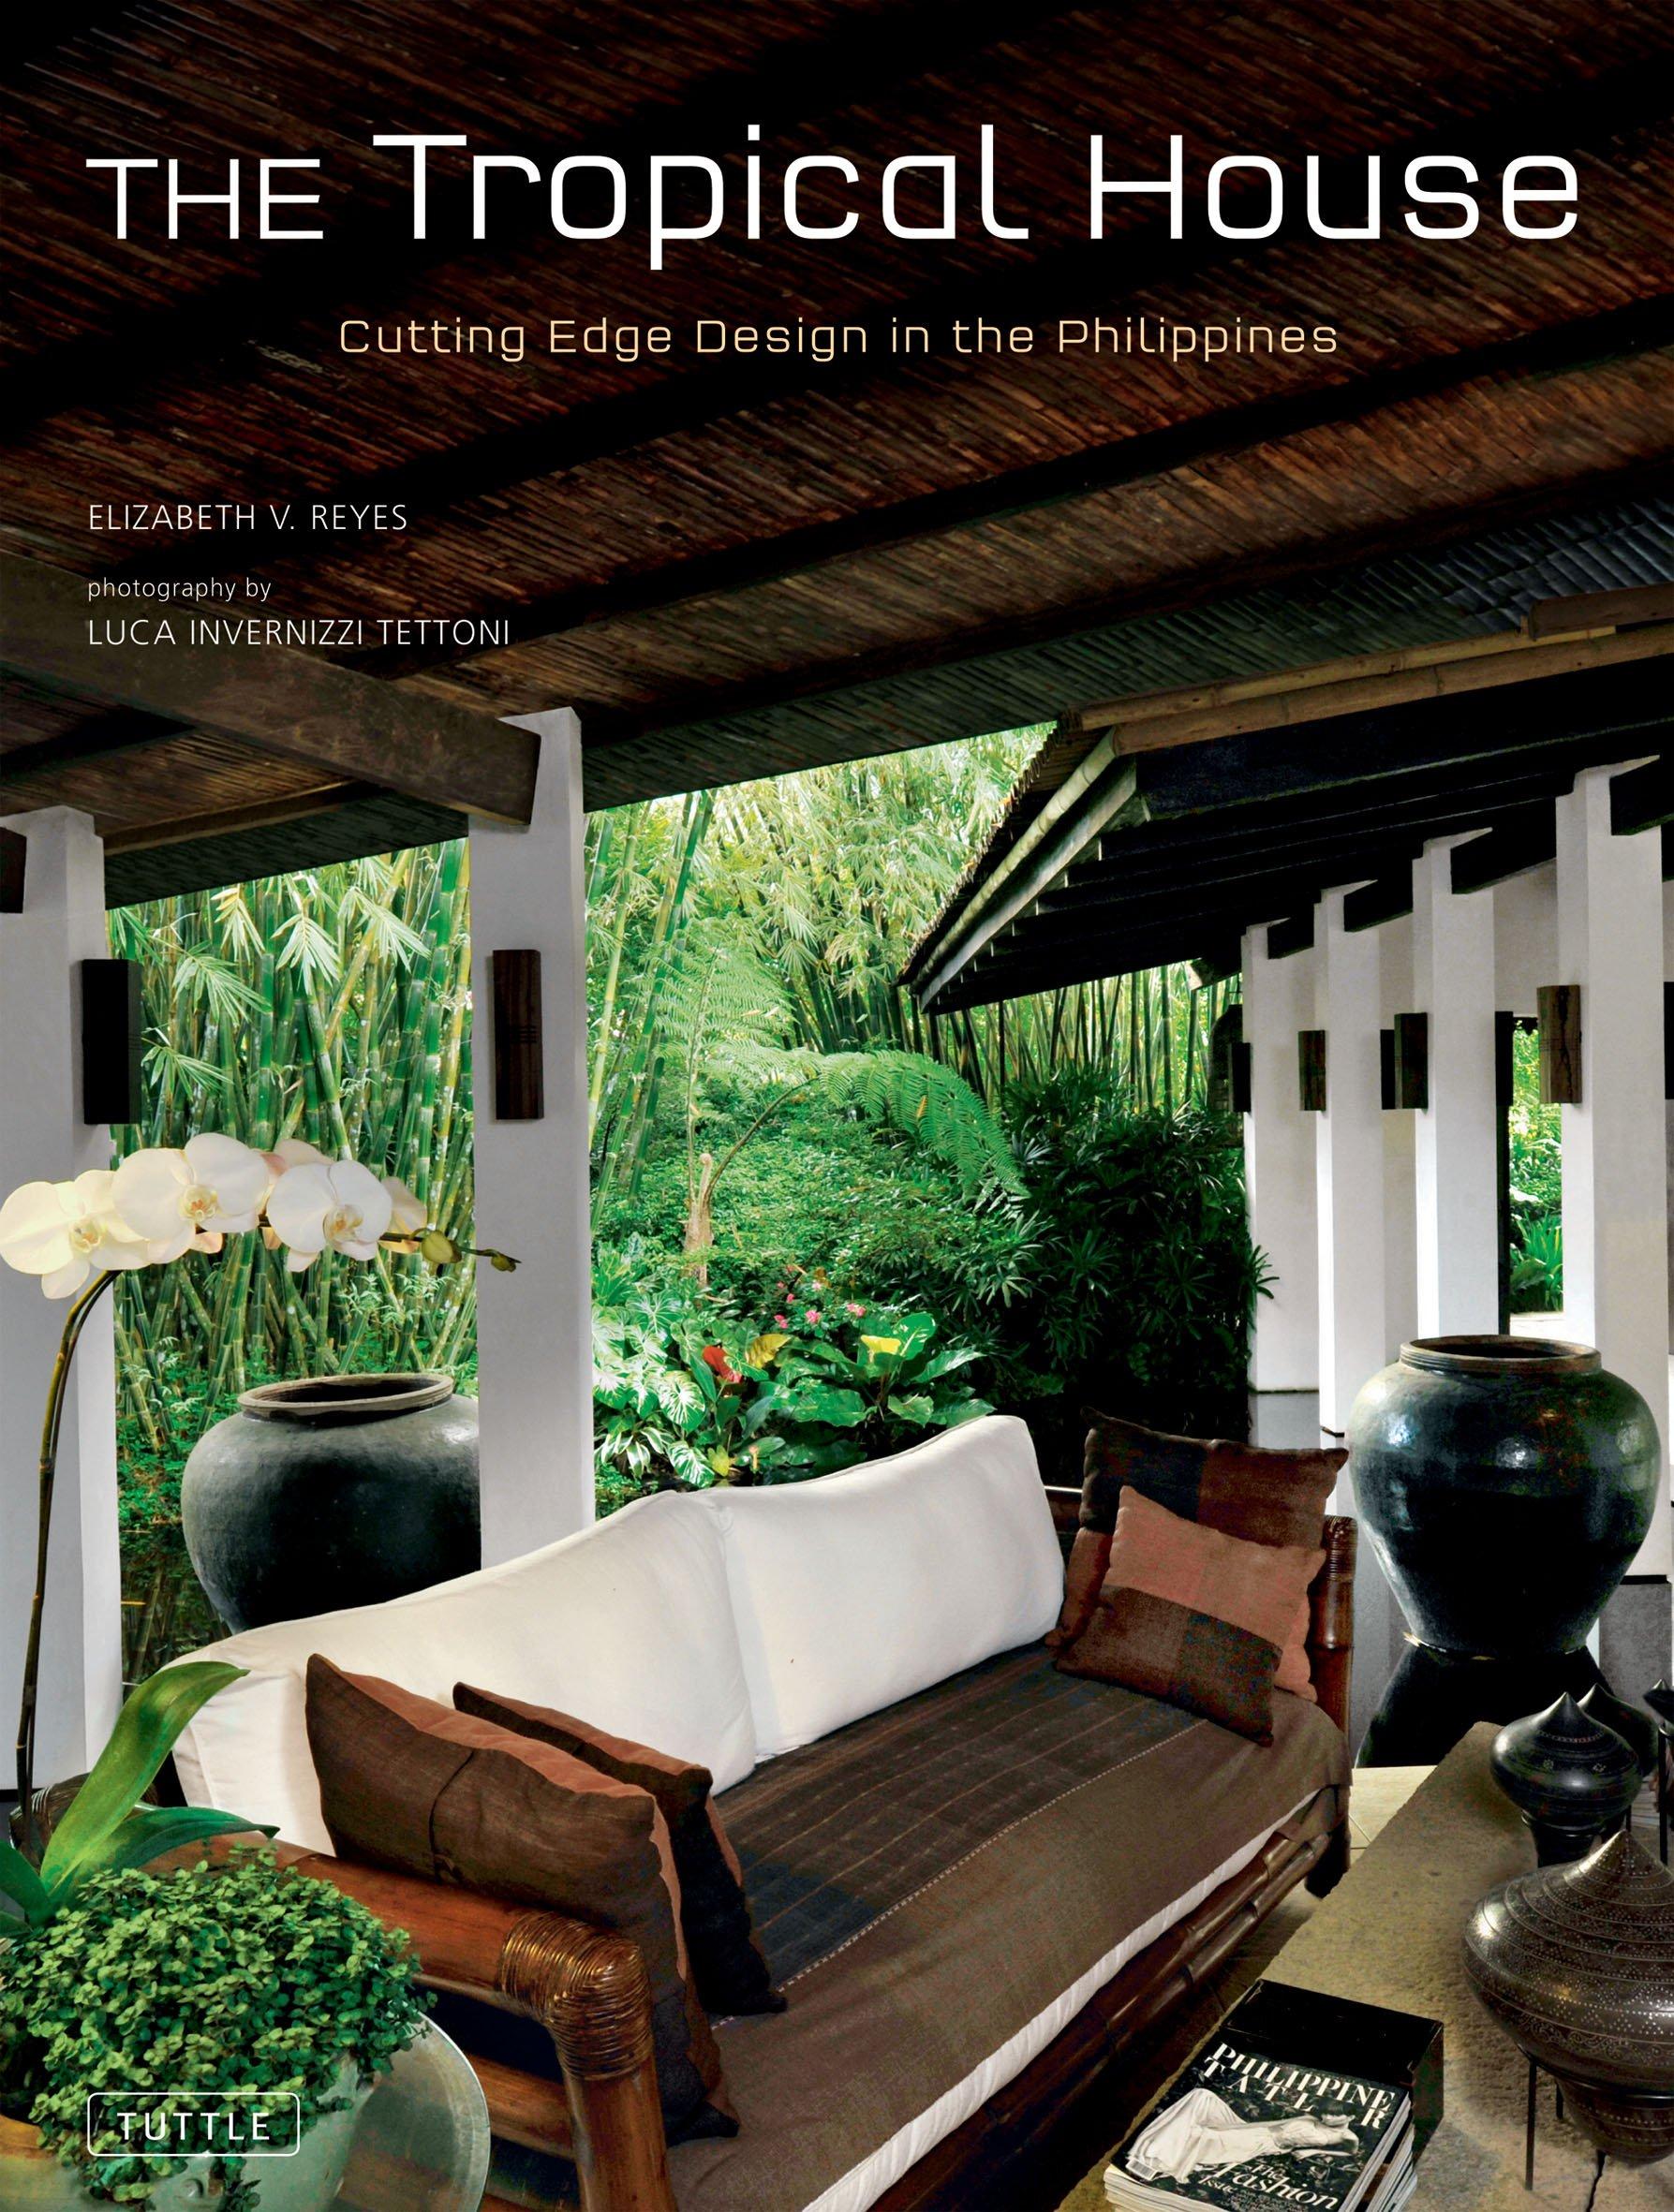 The Tropical House Cutting Edge Design In The Philippines Reyes Elizabeth Tettoni Luca Invernizzi 9780804840828 Amazon Com Books